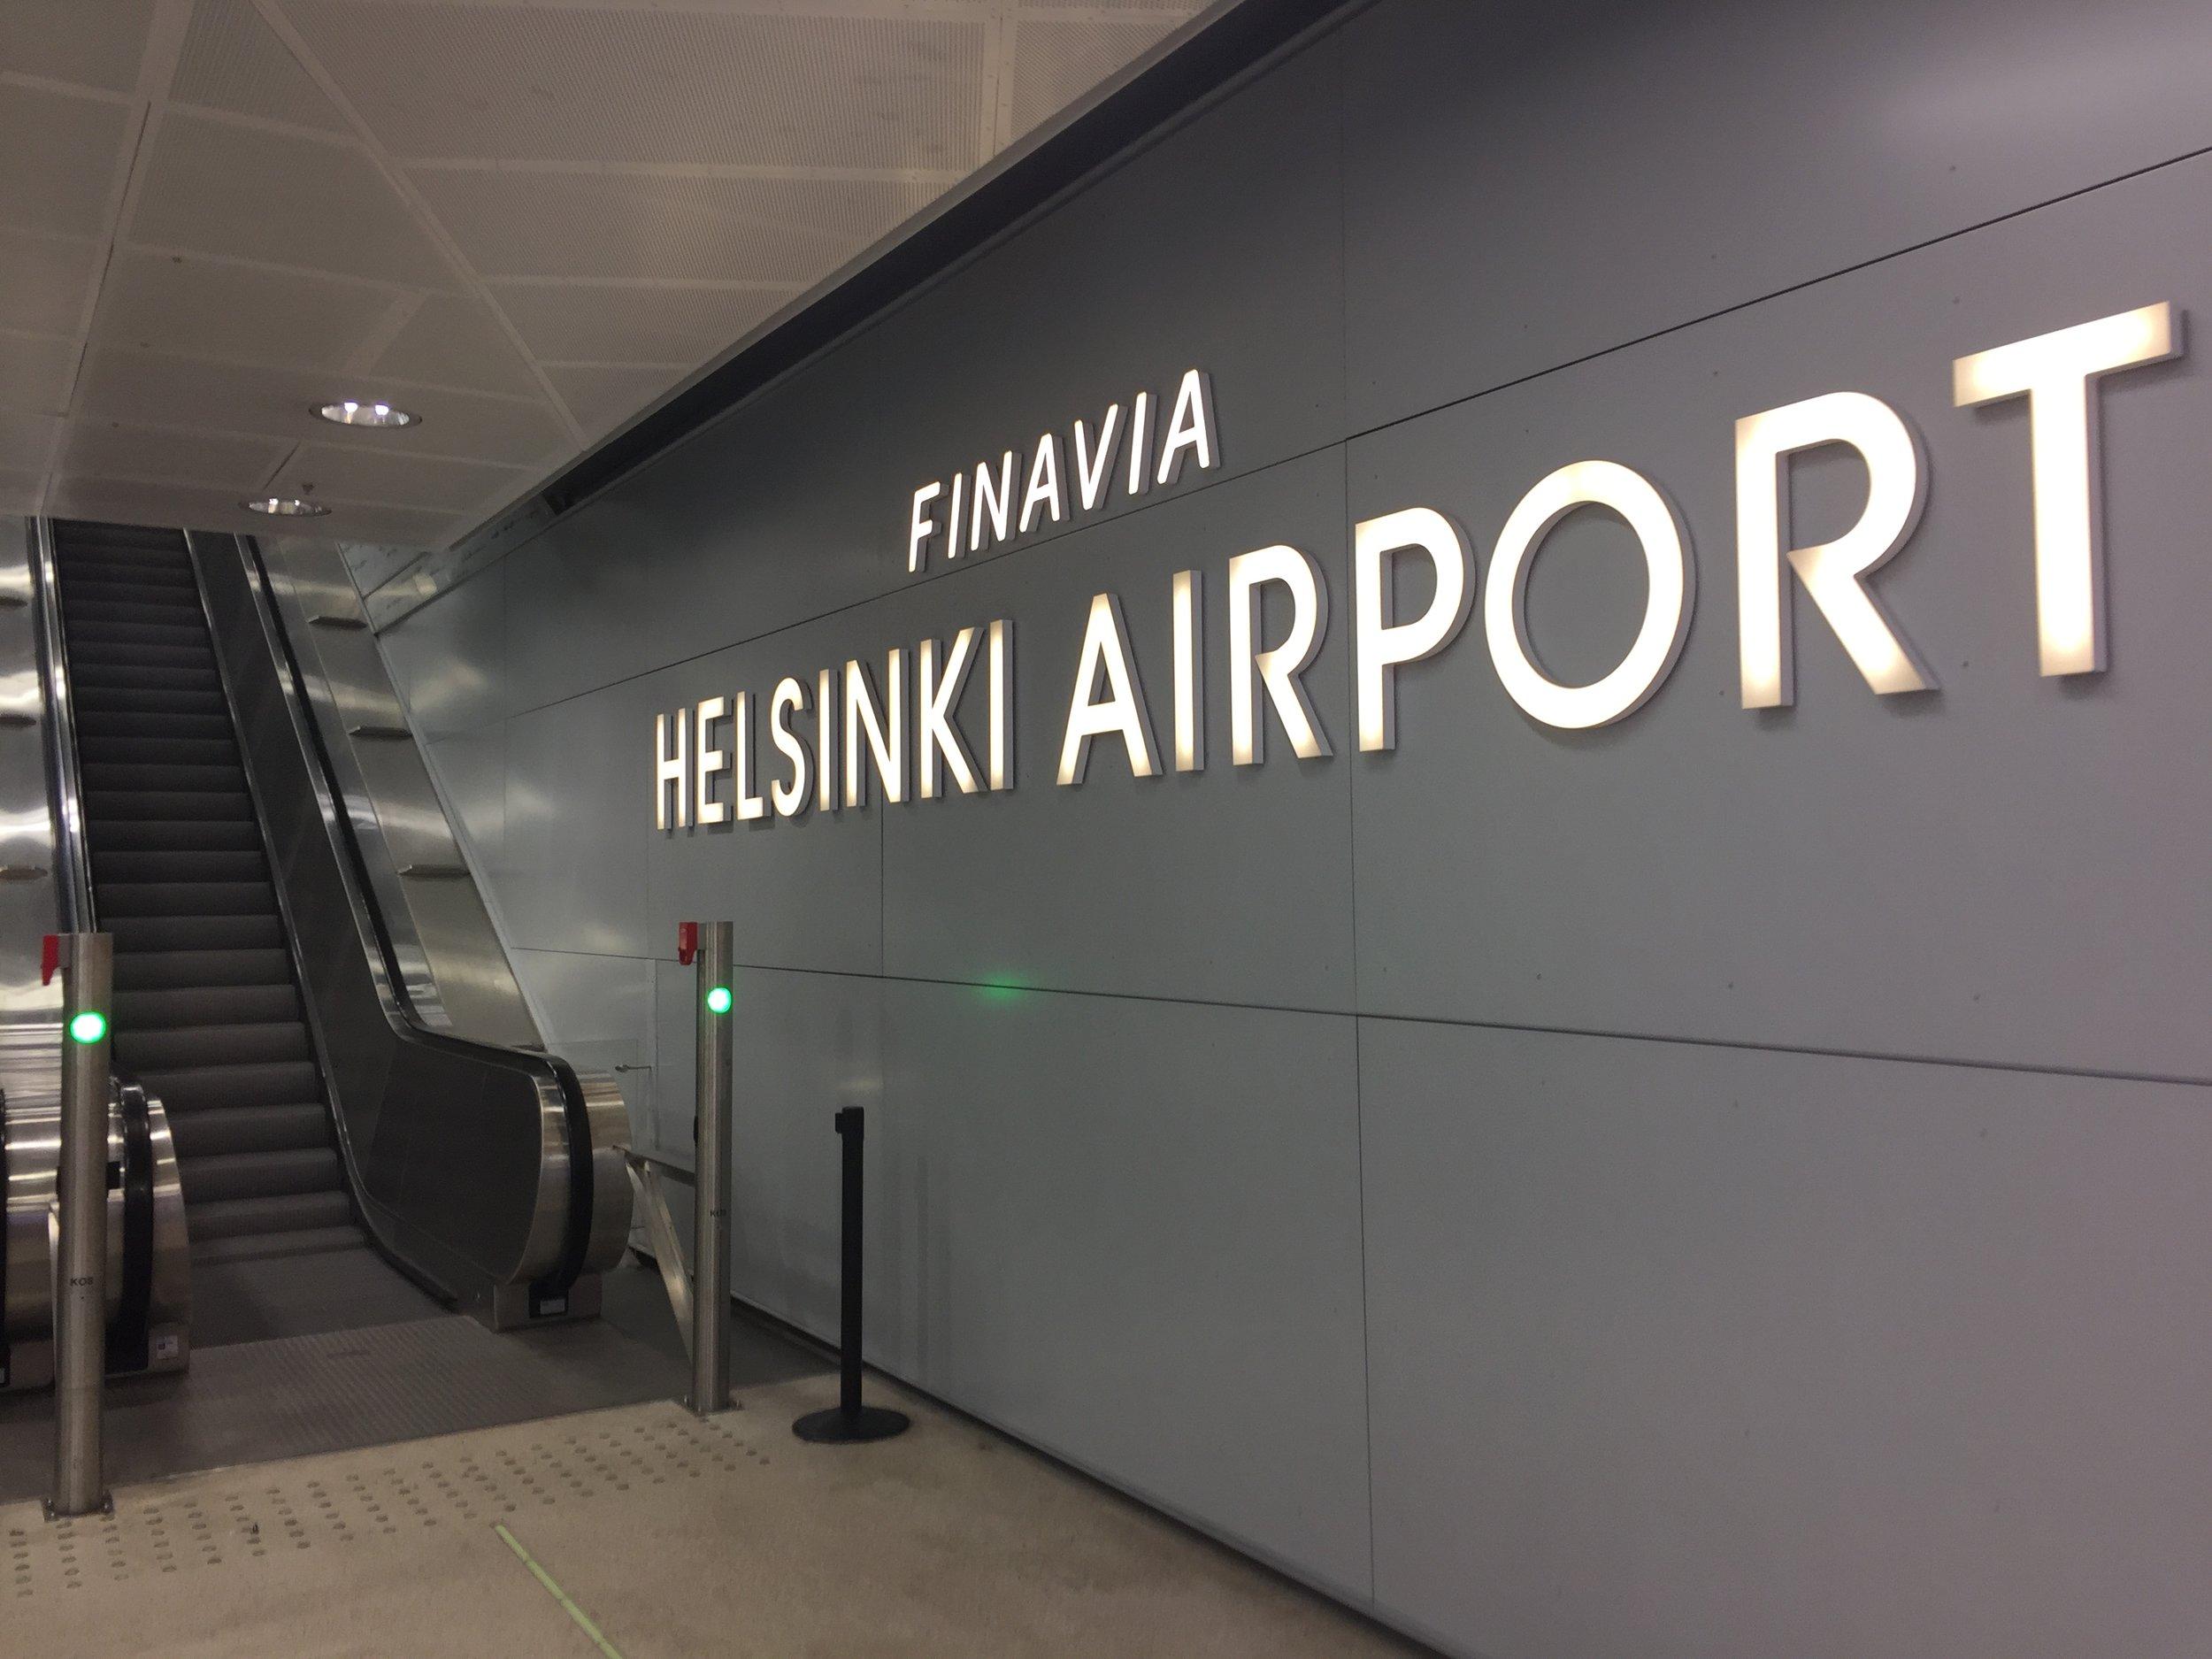 Welcome to Helsinki!